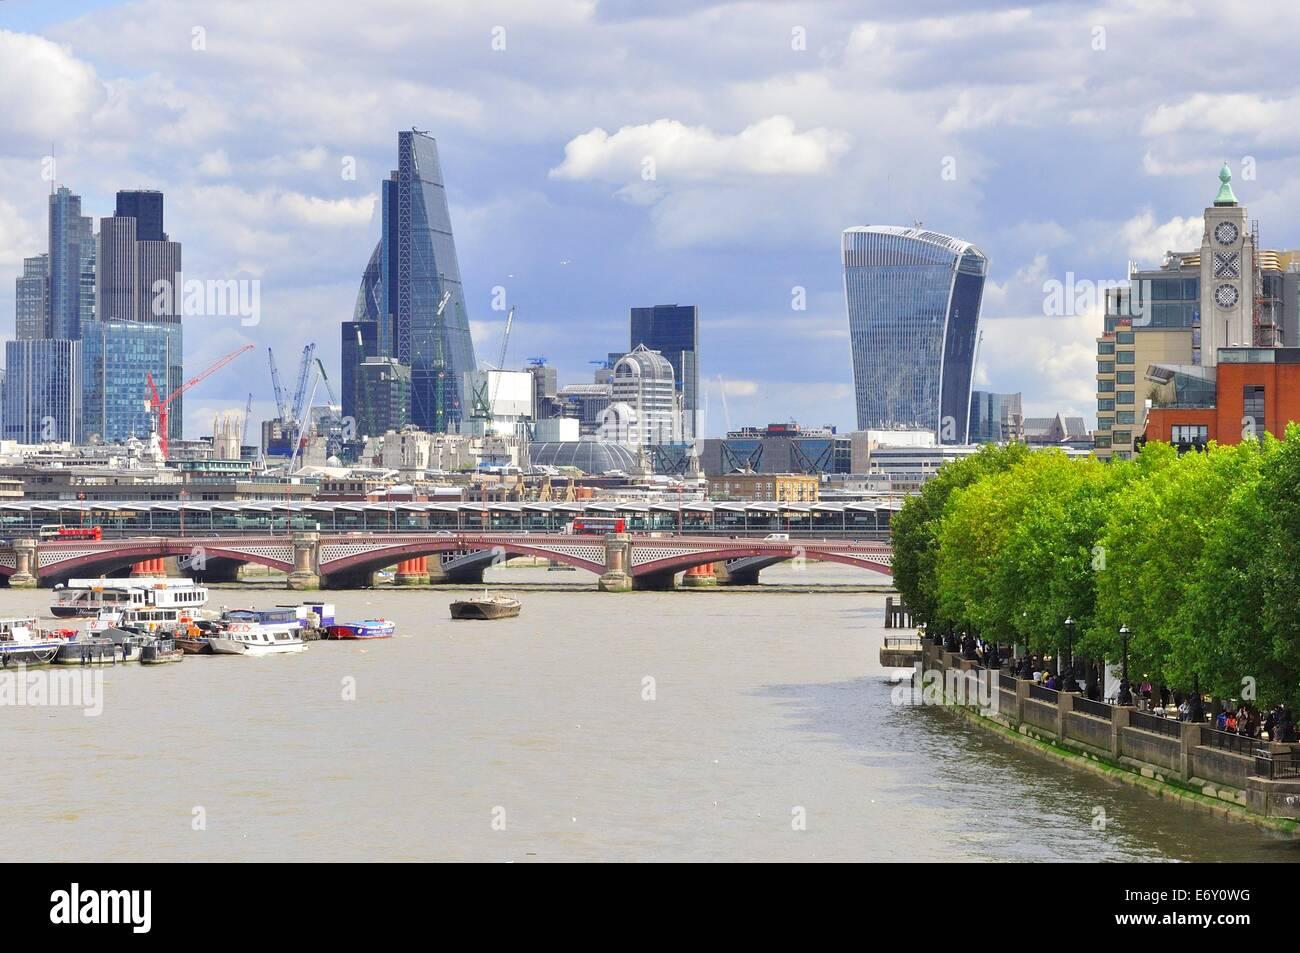 London skyline looking East from Waterloo Bridge. Stock Photo